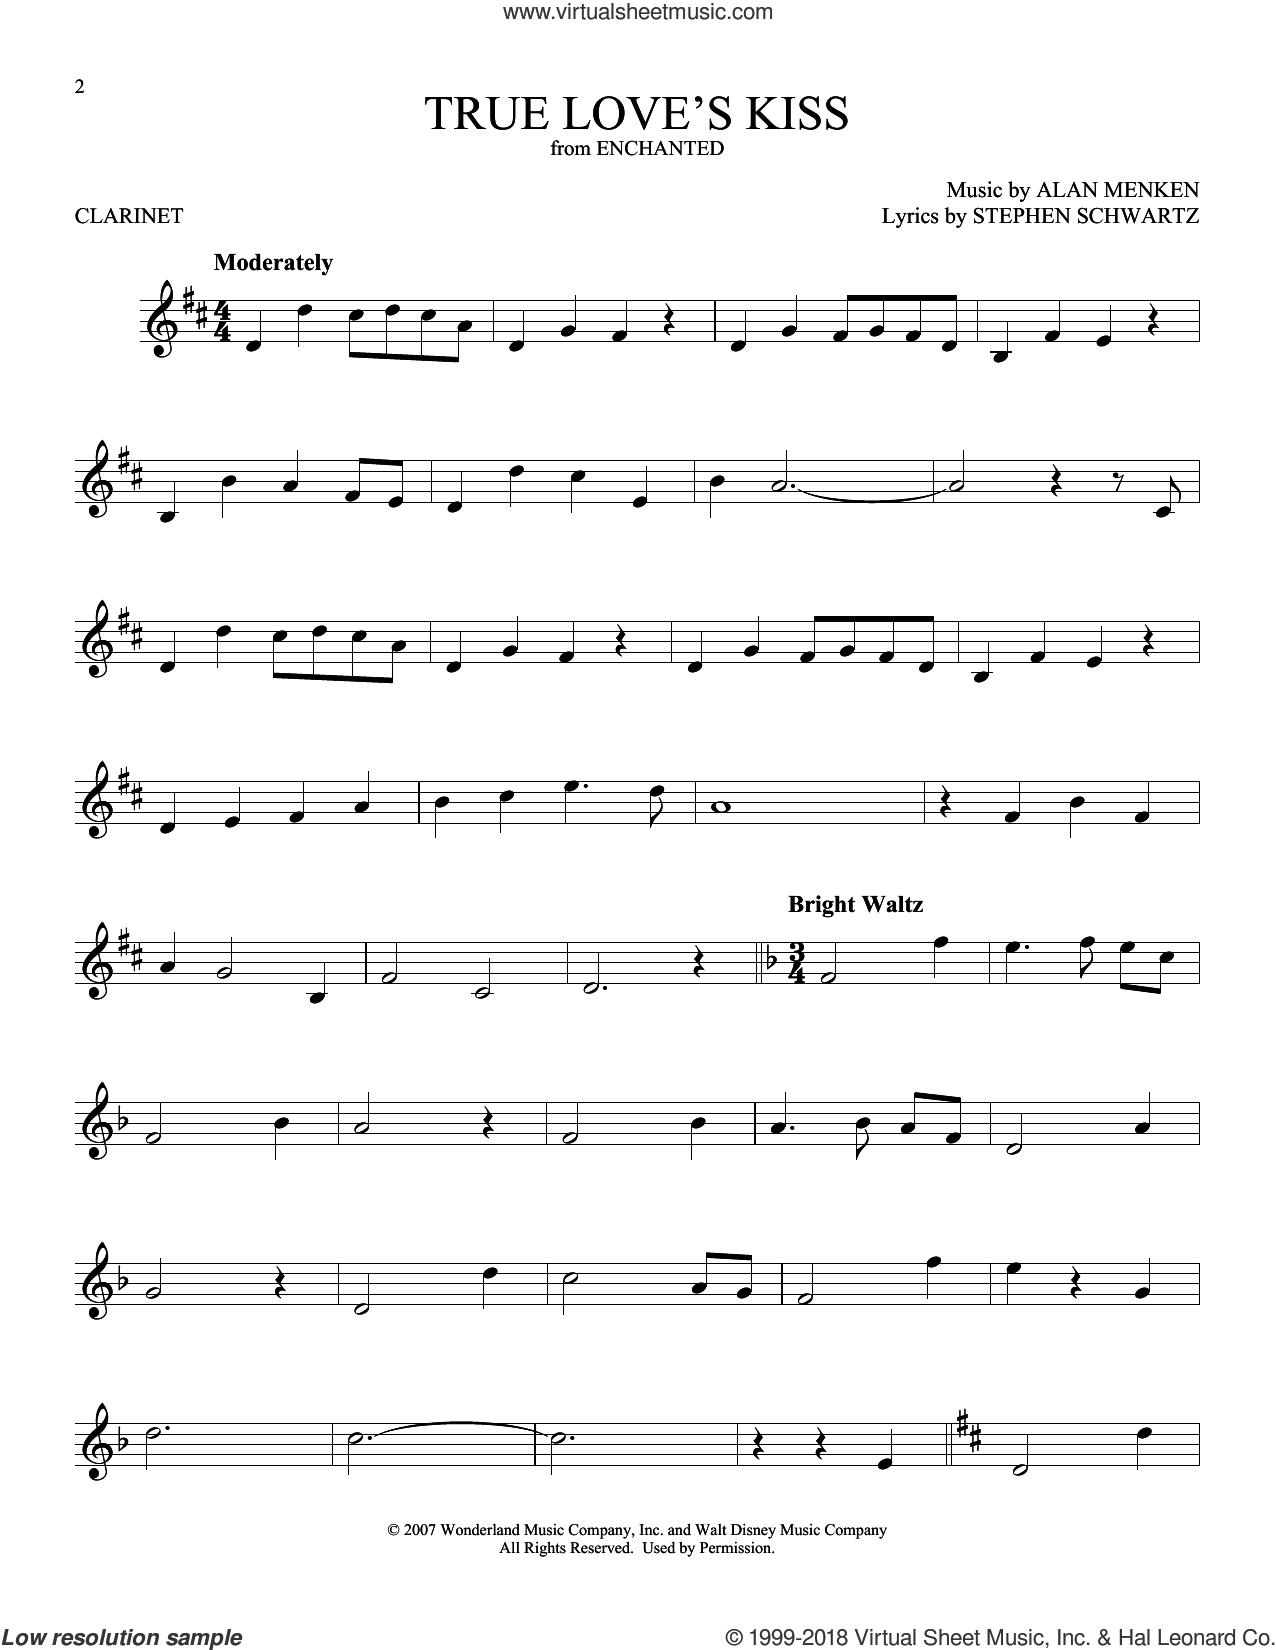 True Love's Kiss sheet music for clarinet solo by Alan Menken and Stephen Schwartz, intermediate skill level